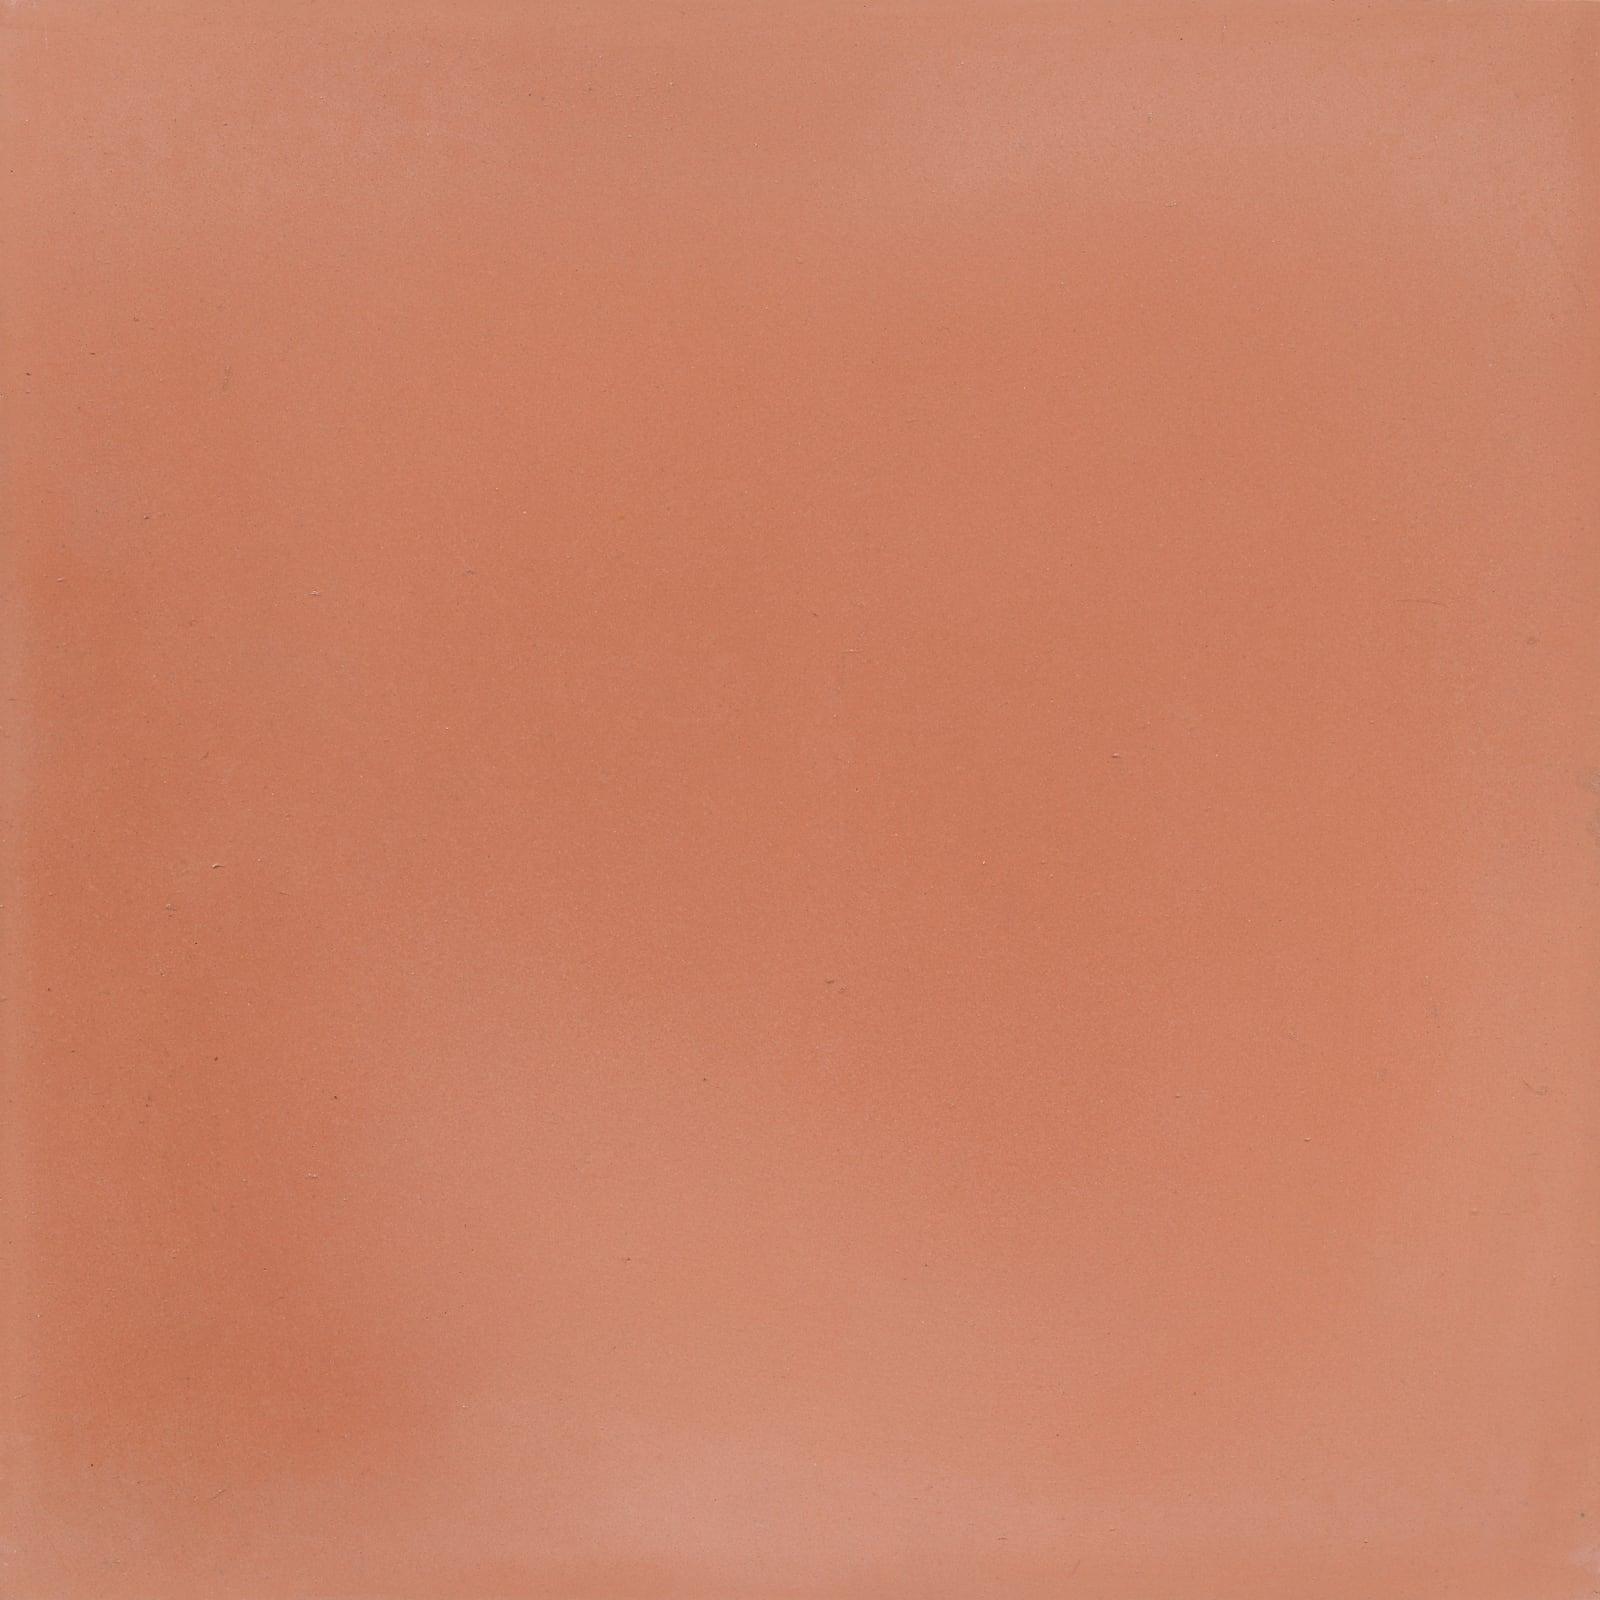 zementfliesen-terrazzofliesen-kreidefarbe-terrazzo-fugenlos-viaplatten-31 | 31